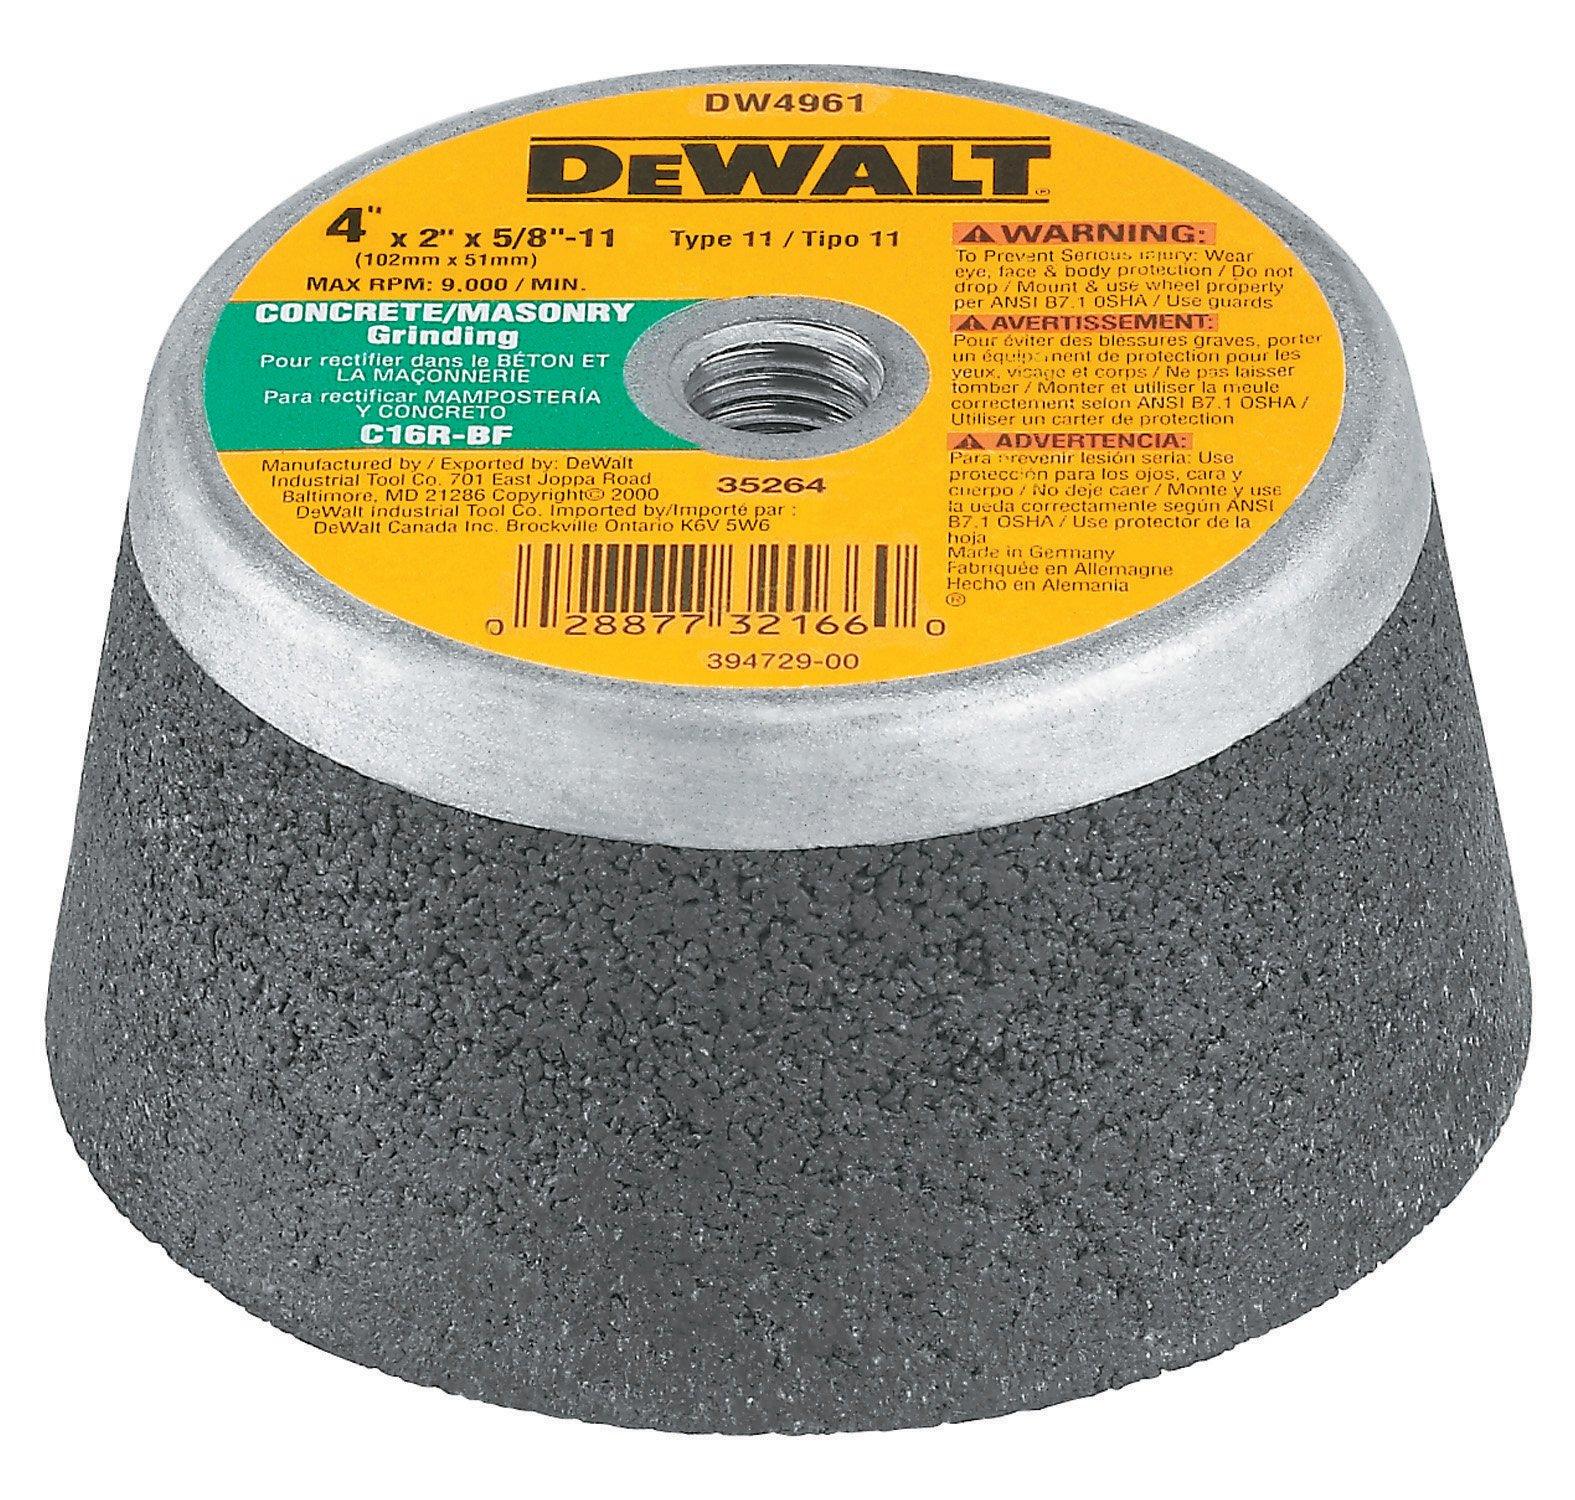 DEWALT DW4961 4-Inch by 2-Inch by 5/8-Inch -11 Concrete/Masonry Grinding Steel Backed Cup Wheel